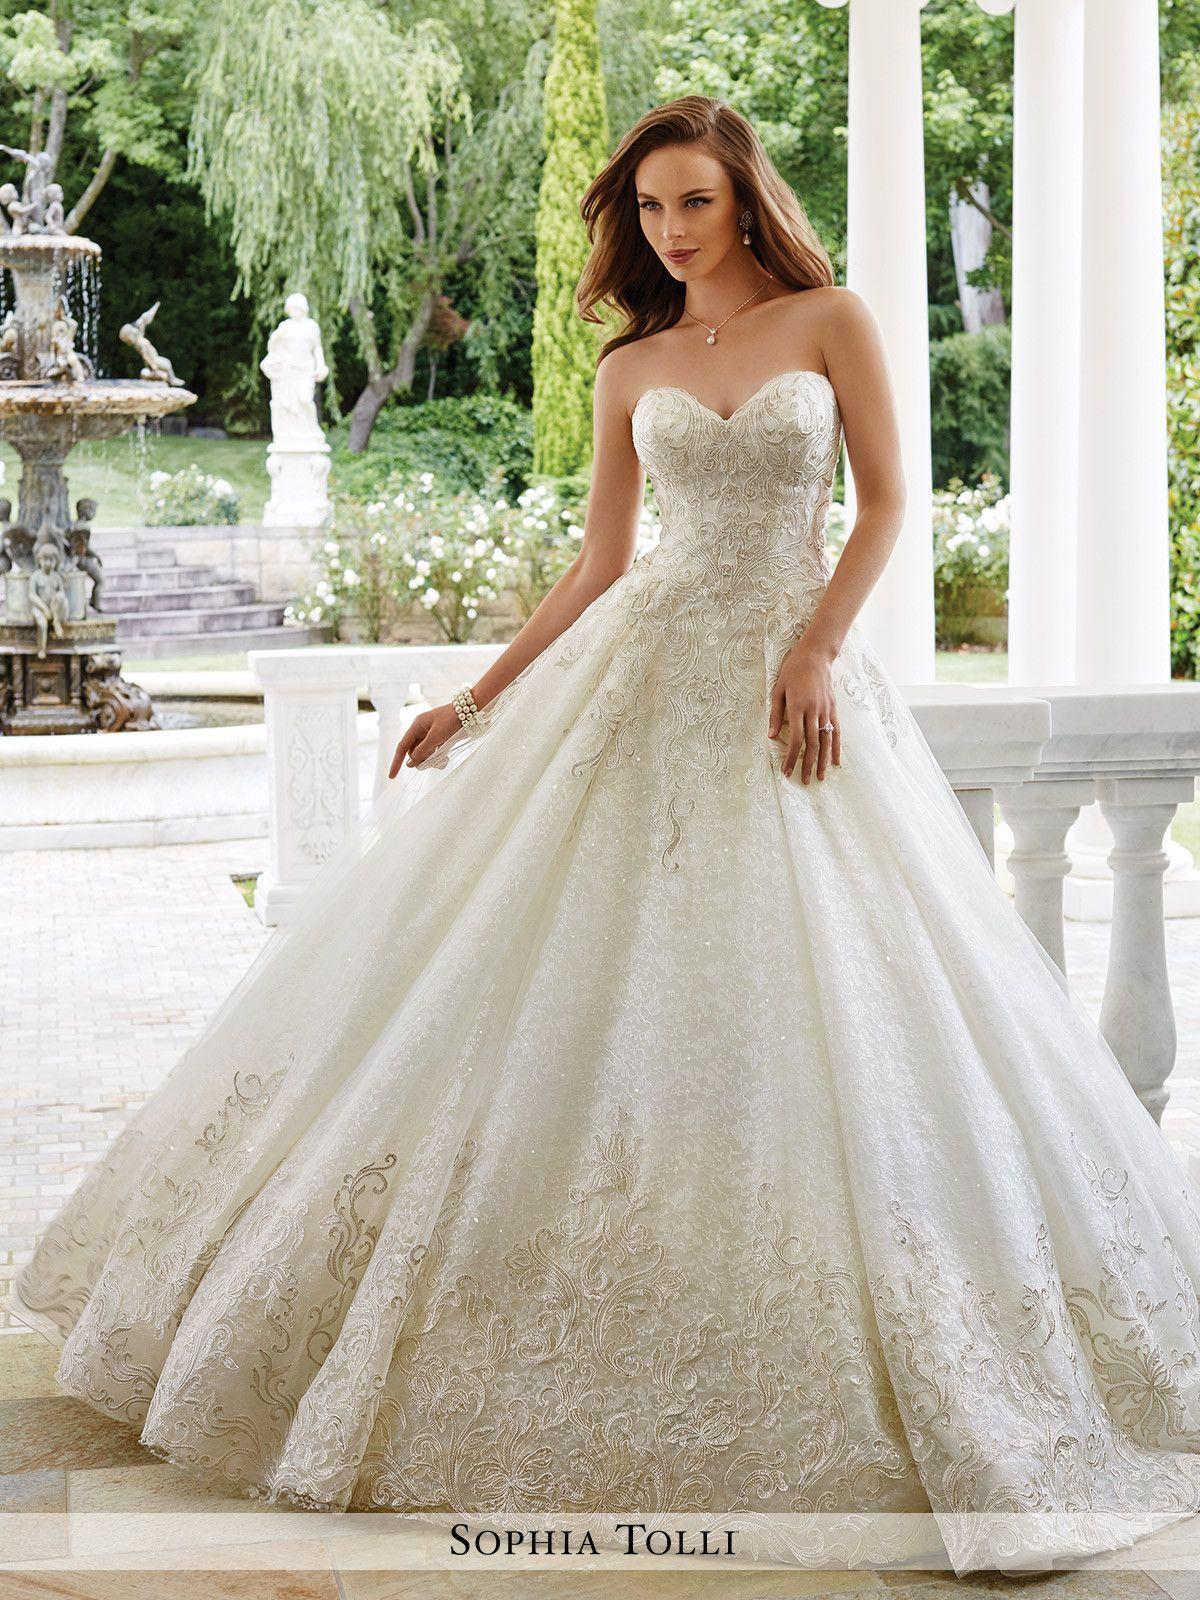 Sophia Tolli - Veneto - Y21661 - All Dressed Up, Bridal Gown ...